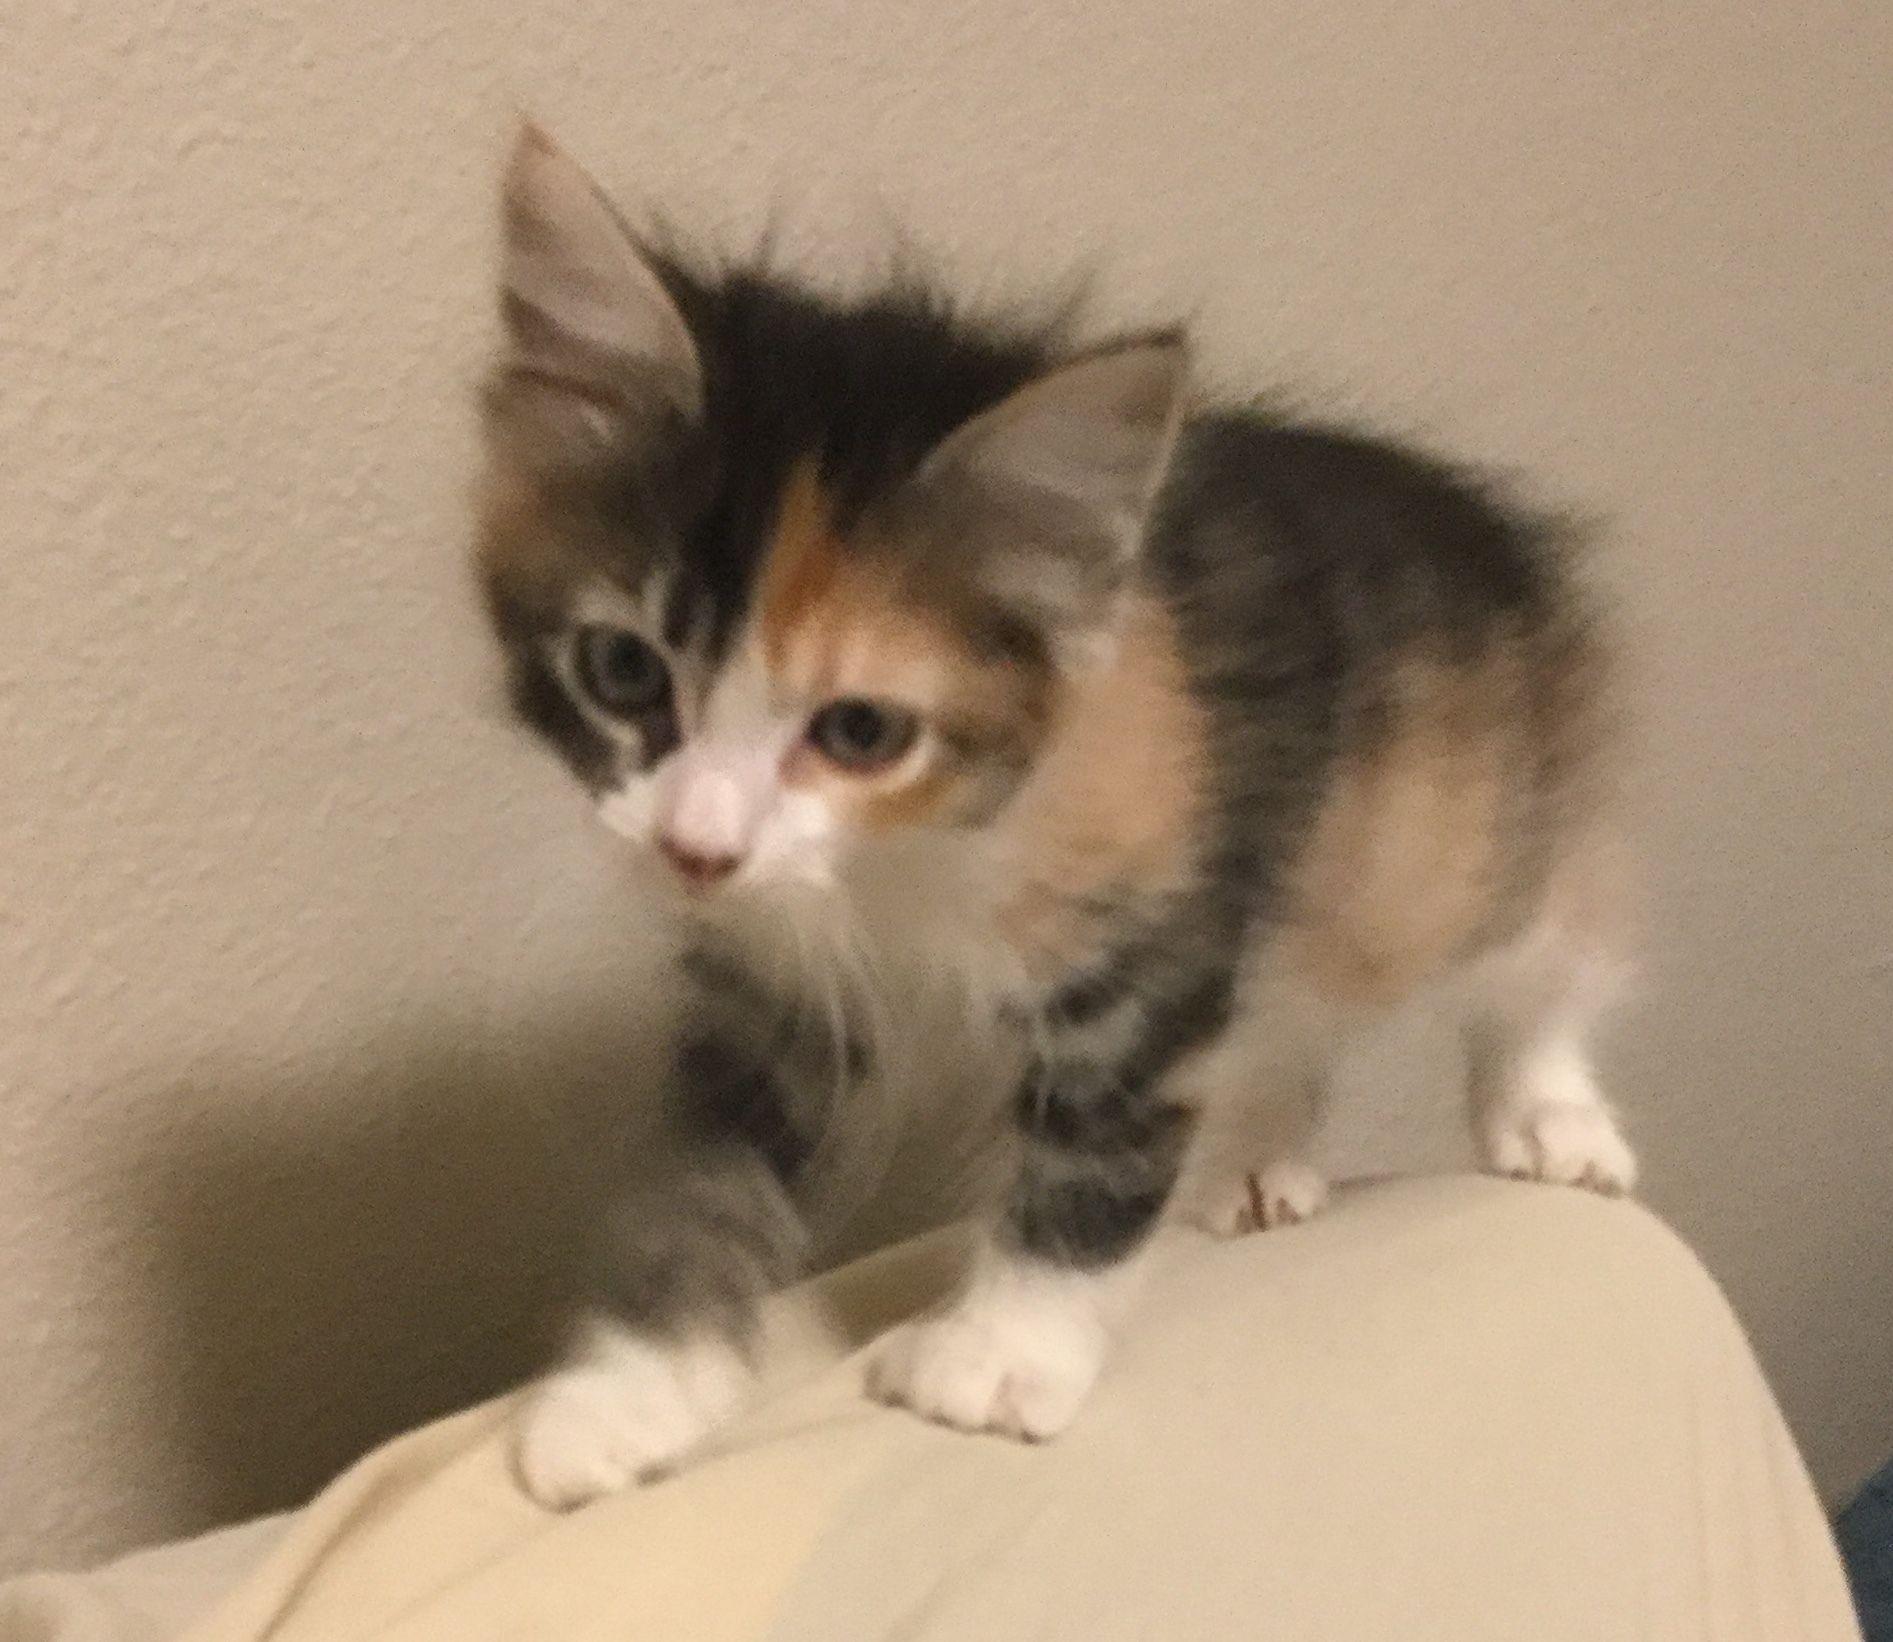 Adopt Calico Kittens On Petfinder In 2020 Calico Kitten Cat Adoption Kittens